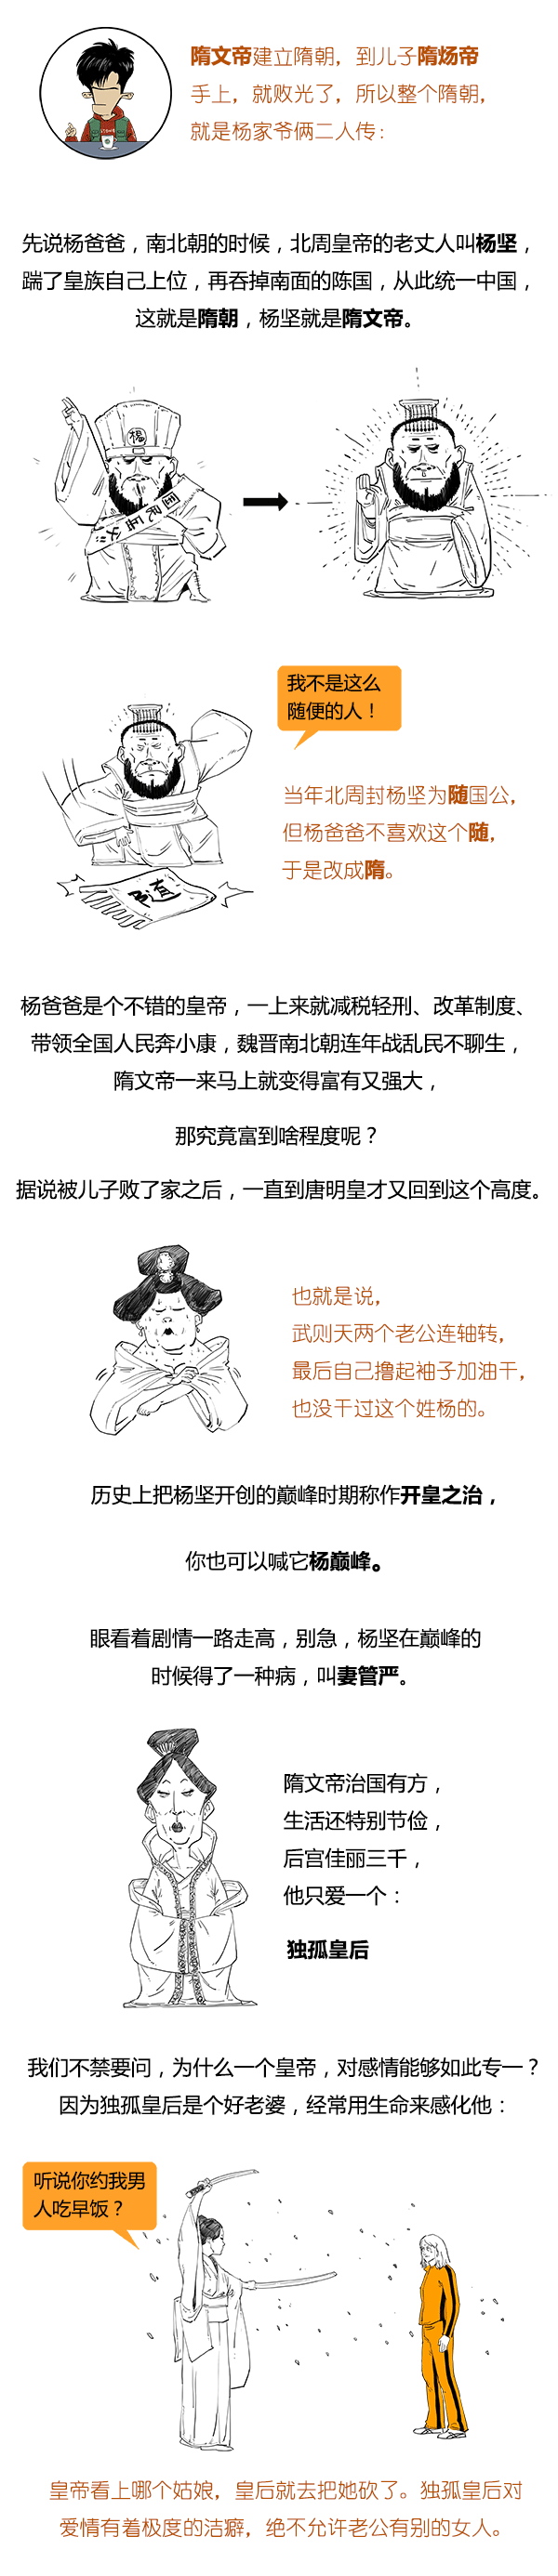 Stone历史剧-隋_02.png